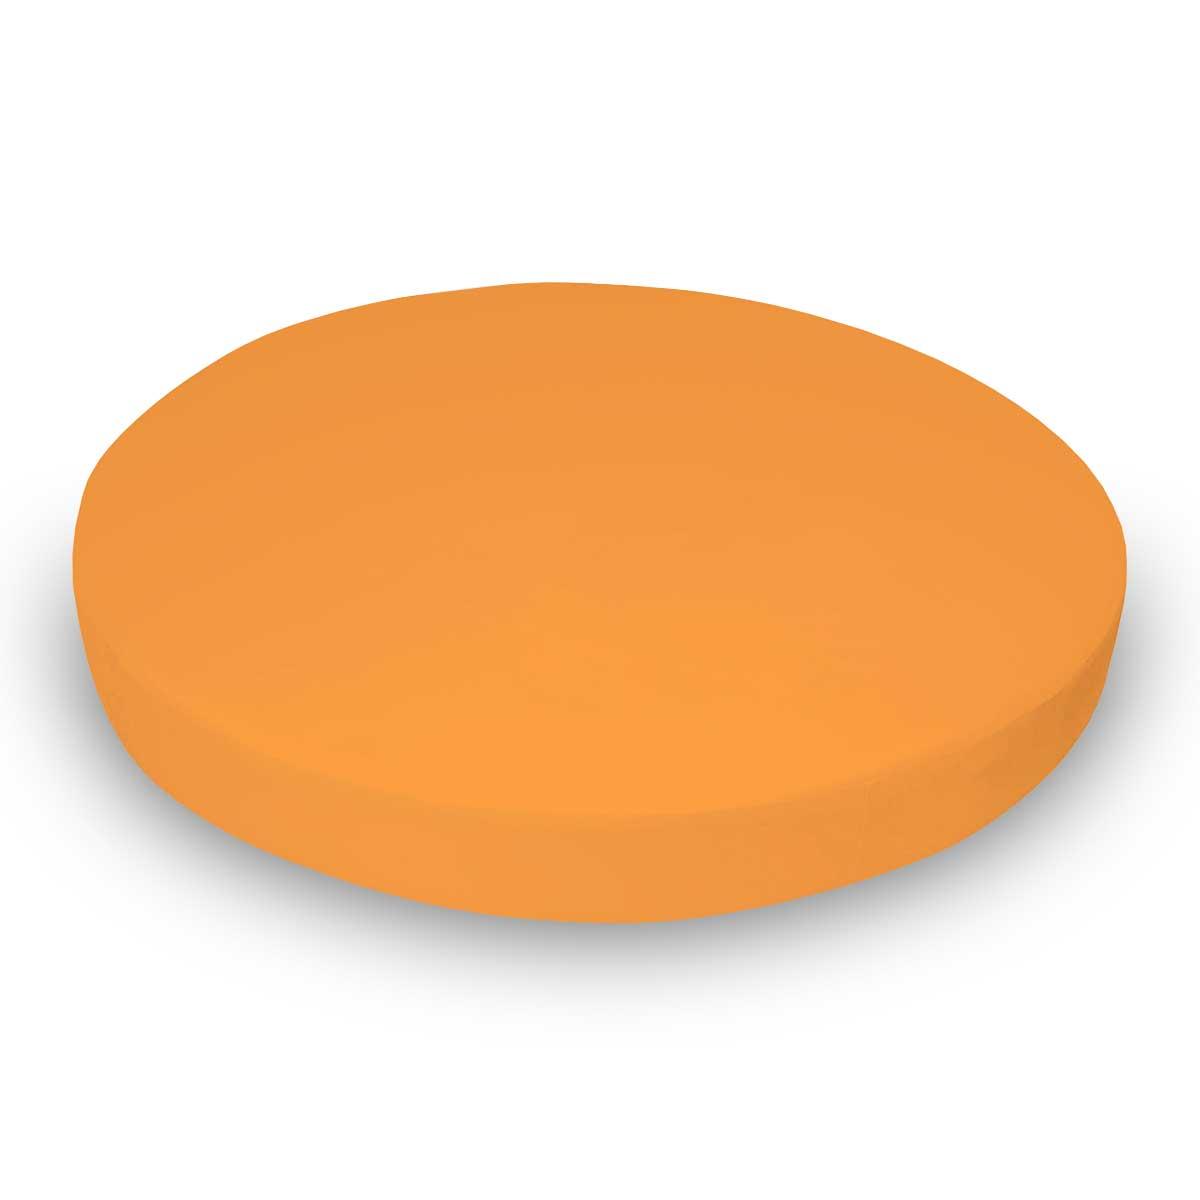 Solid Orange Jersey Knit